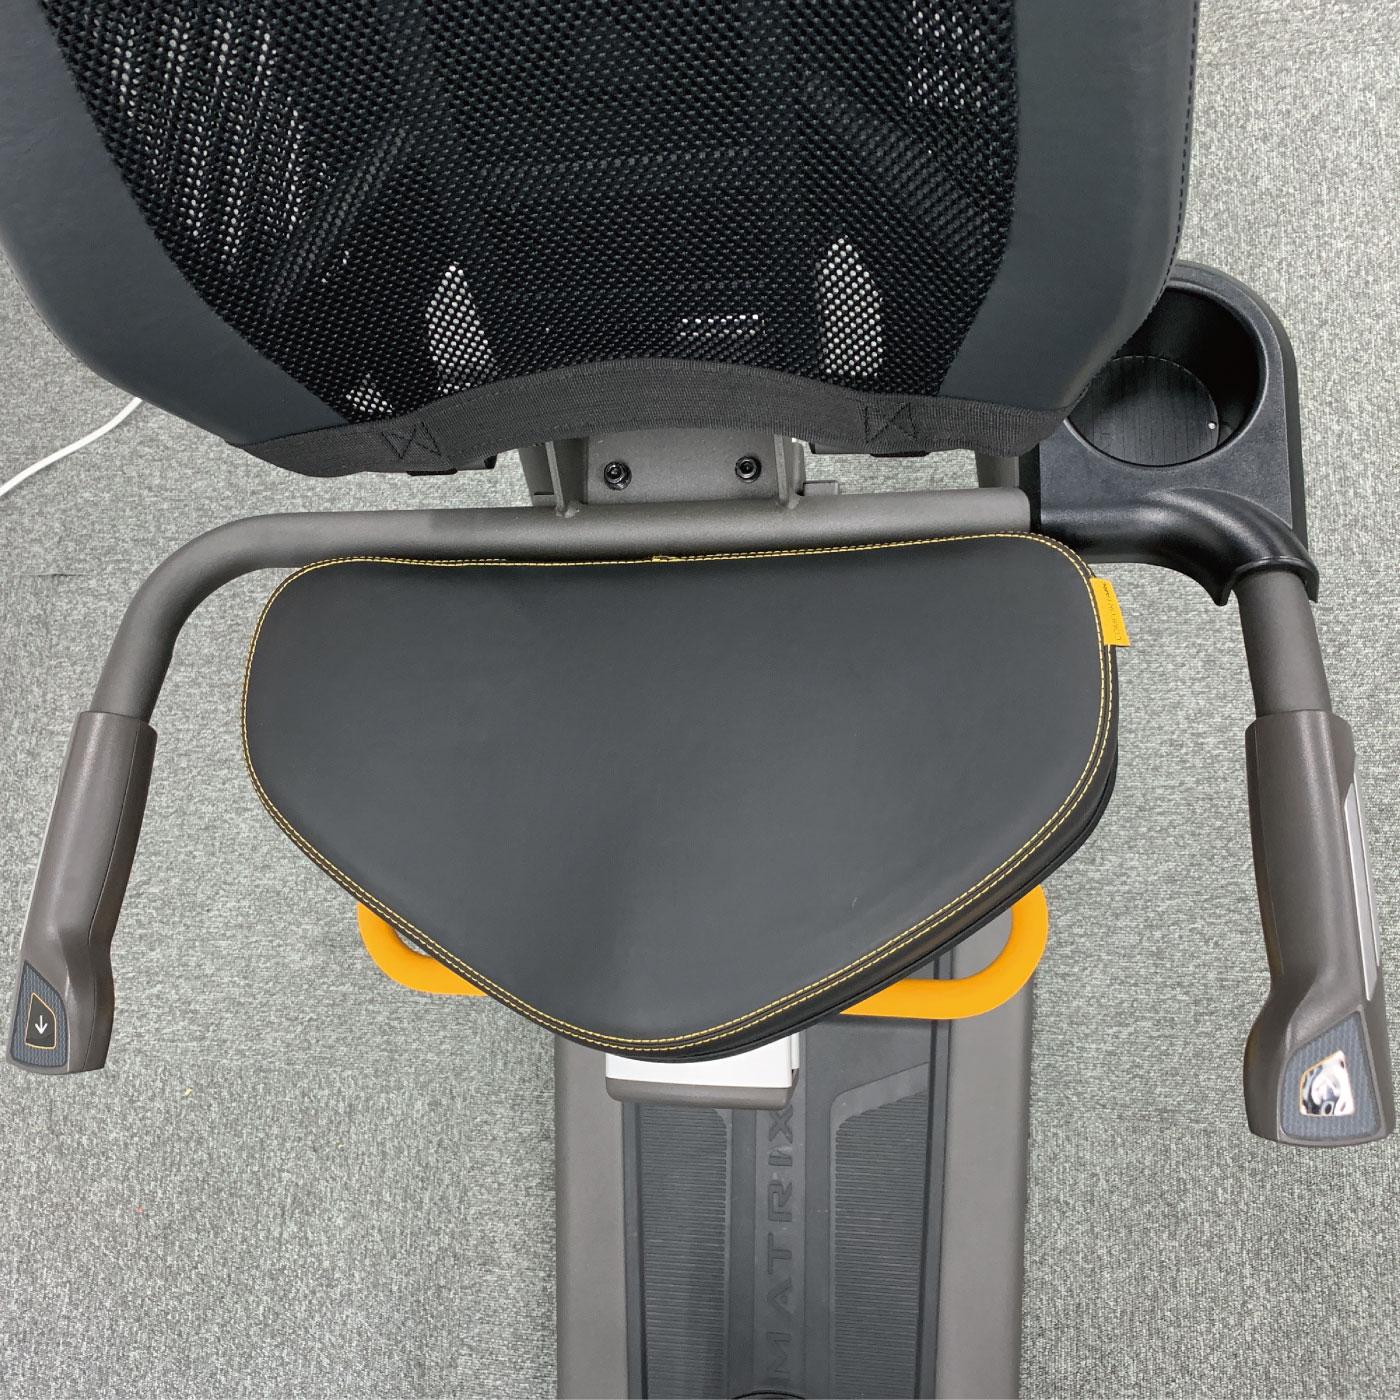 R50-XIR/家庭用リカンベントバイク〈家庭用MATRIX〉《ジョンソンヘルステック》